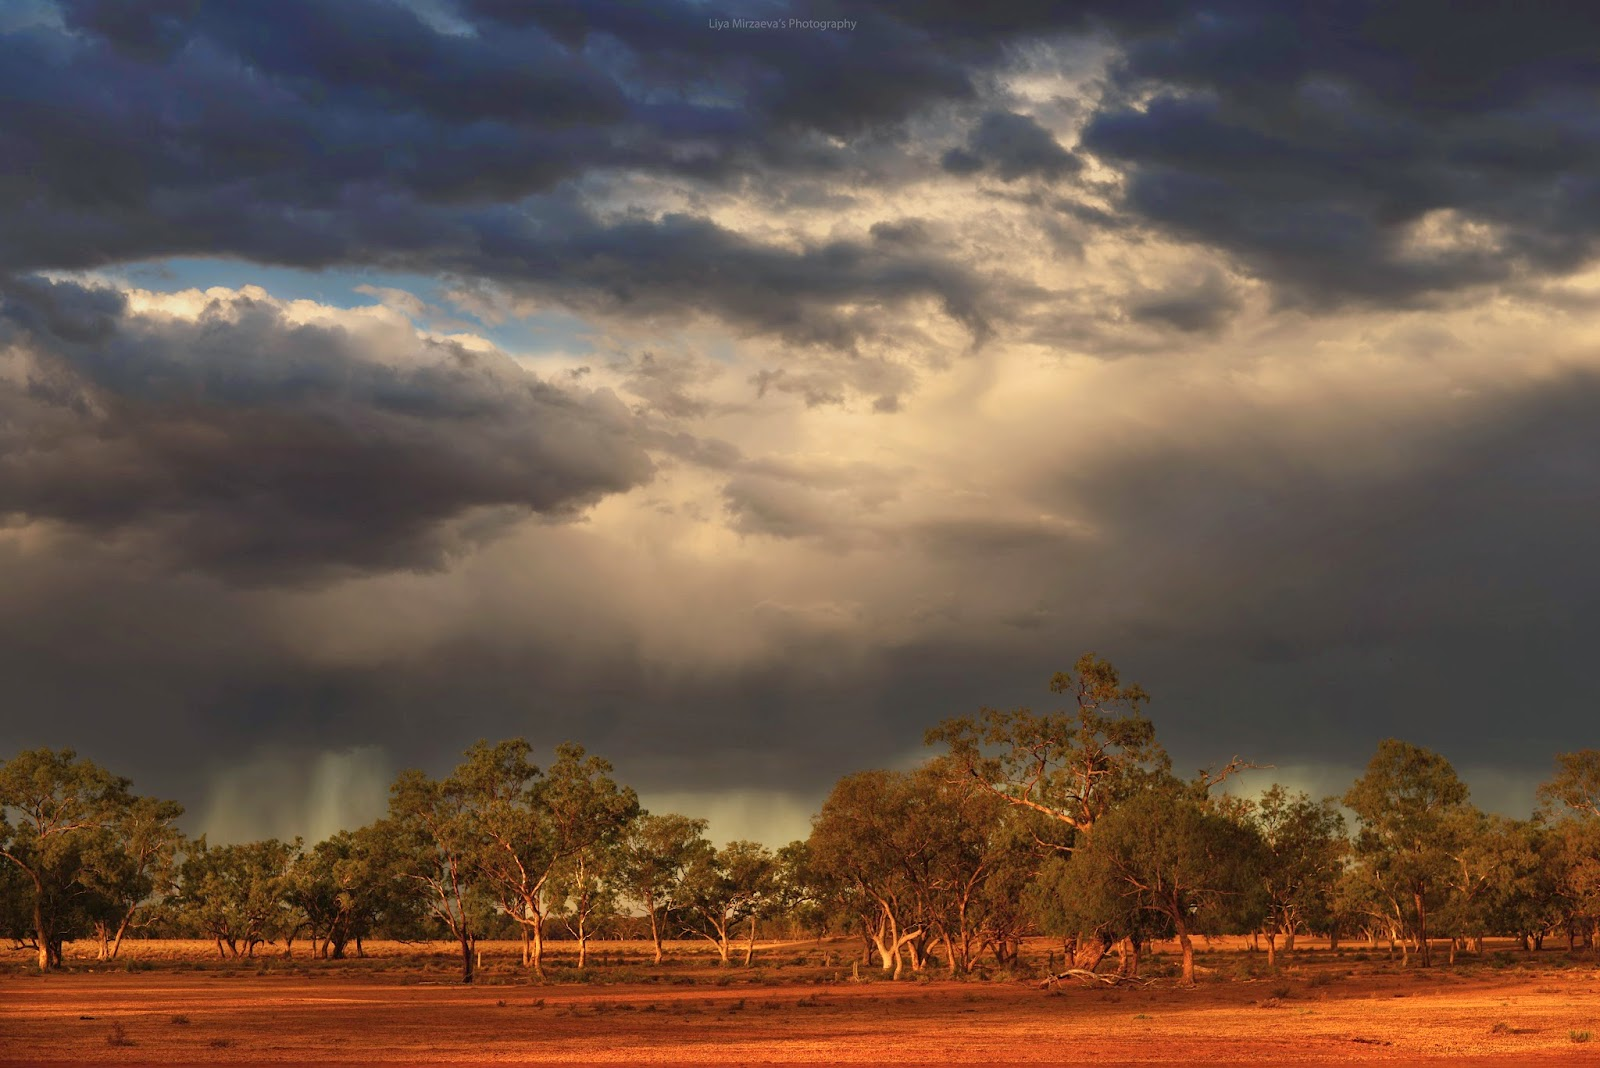 me, travel, traveler, australia, sydney, walgett, journey, amazing, wow, sun, sunset, pretty, storm, trees, nature, clouds, sun, horses, animals, farm, liya mirzaeva farmer, love